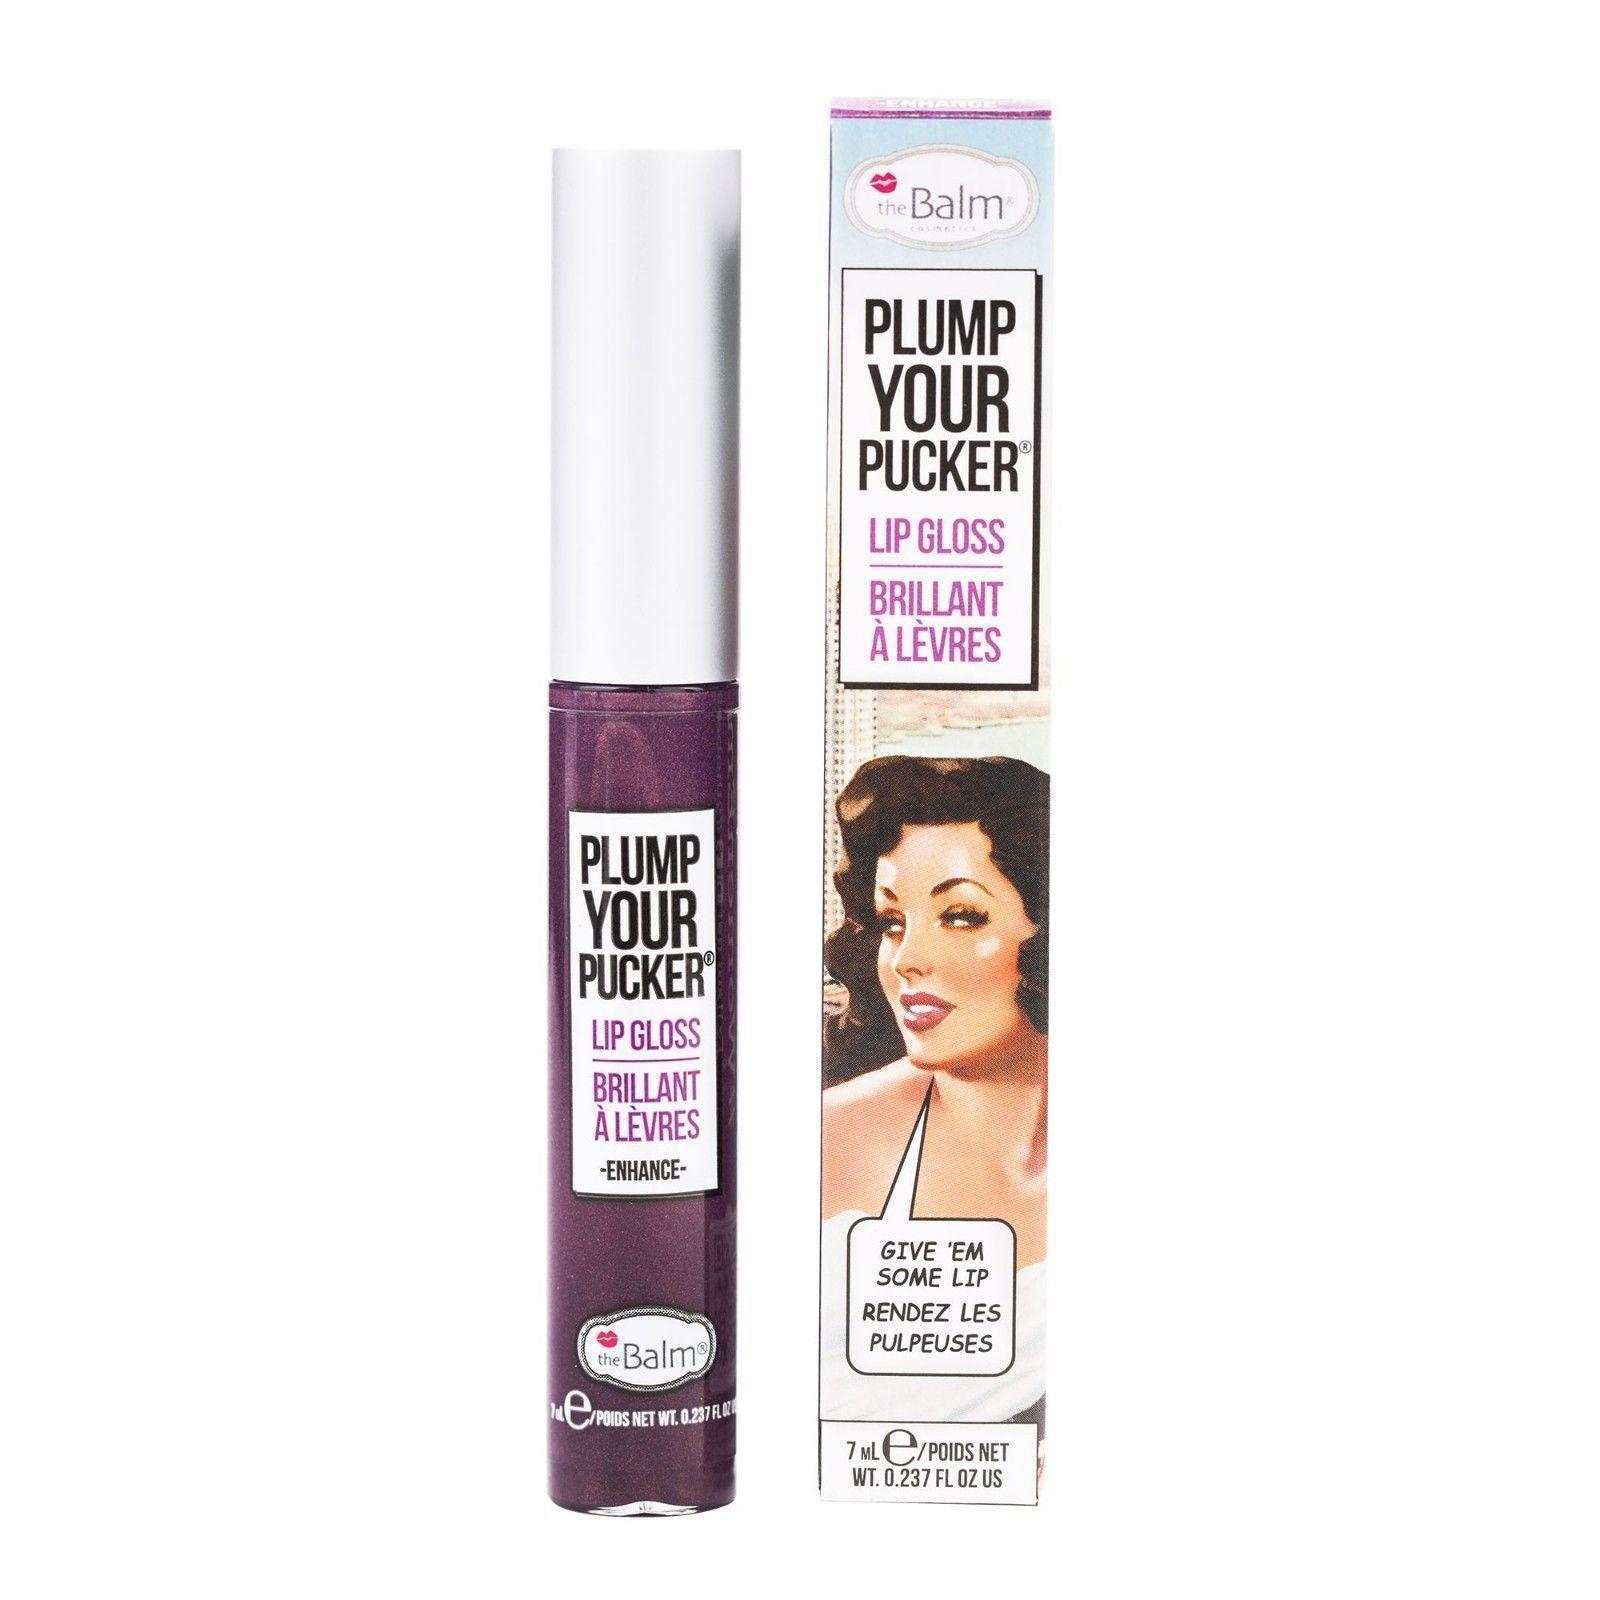 The Balm Plump Your Pucker Lip Gloss Enhance Mini